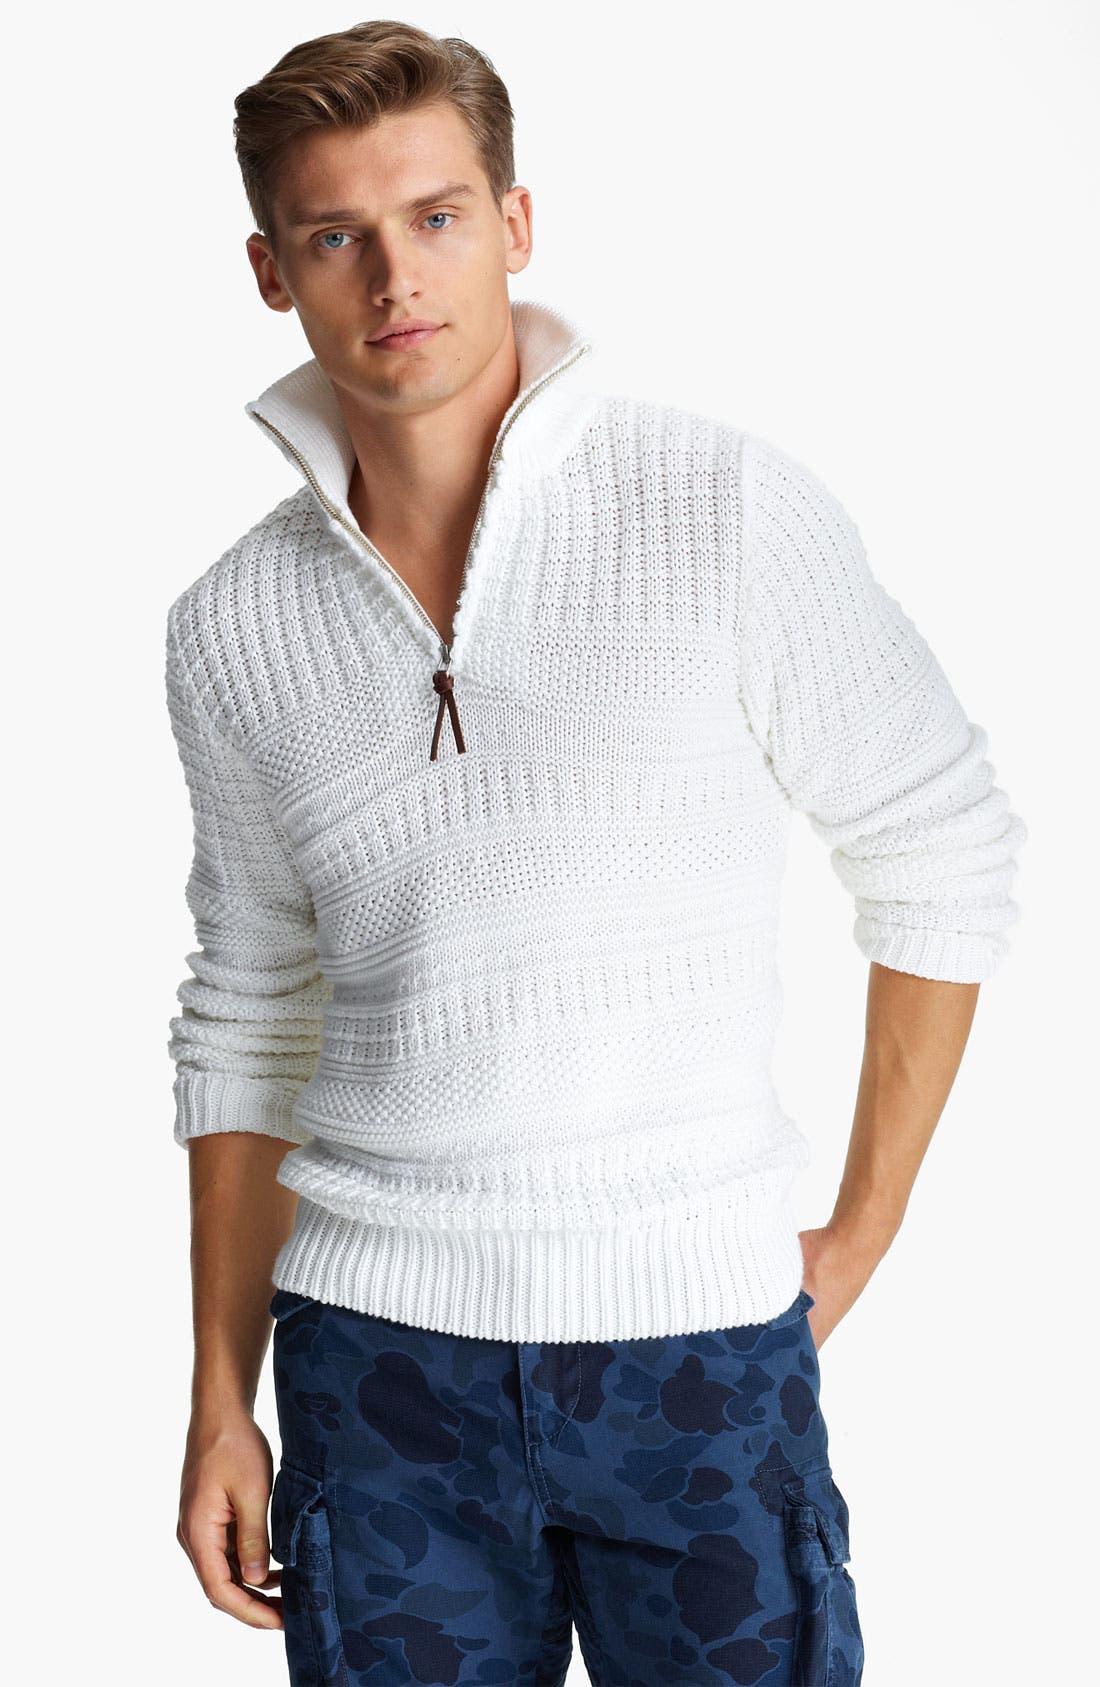 Alternate Image 1 Selected - Gant by Michael Bastian Quarter Zip Pullover Sweater